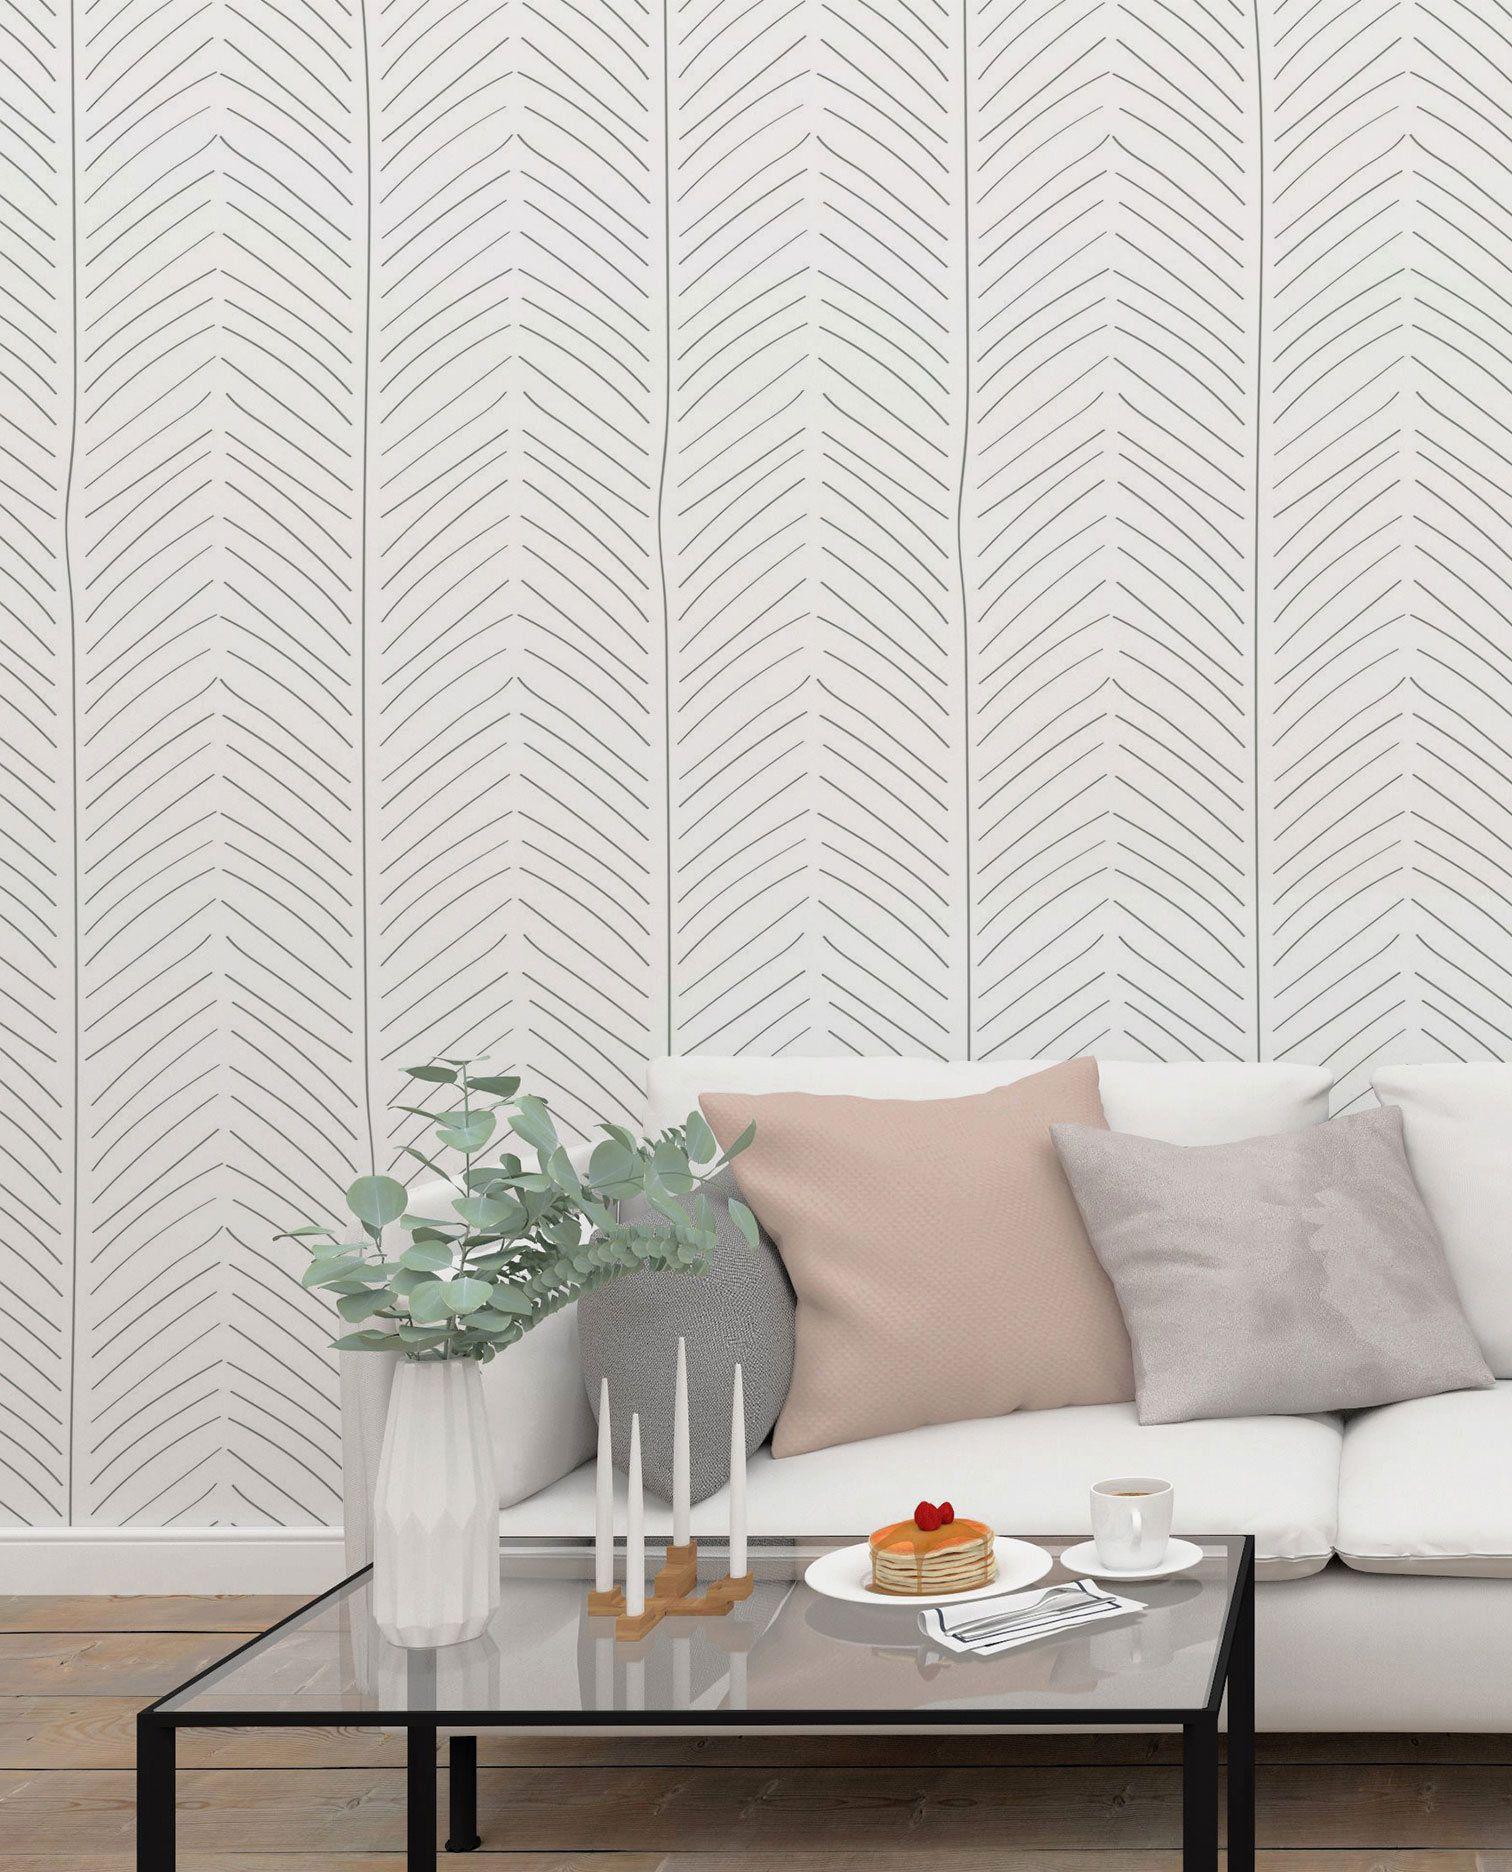 Herringbone Wallpaper, Removable Wallpaper, Smooth